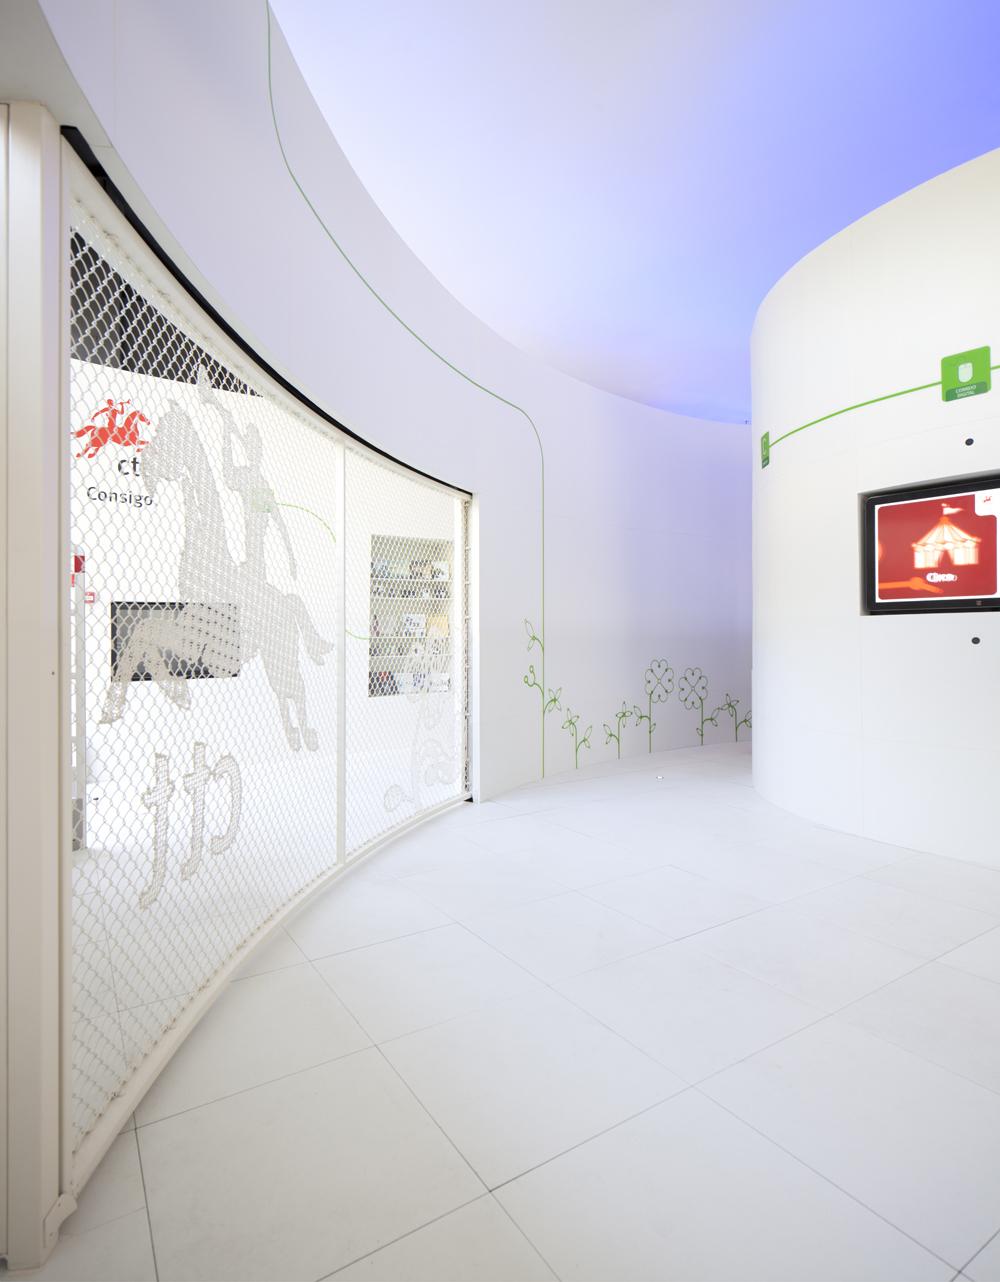 CTT – Flagship Store / 24h Post Office